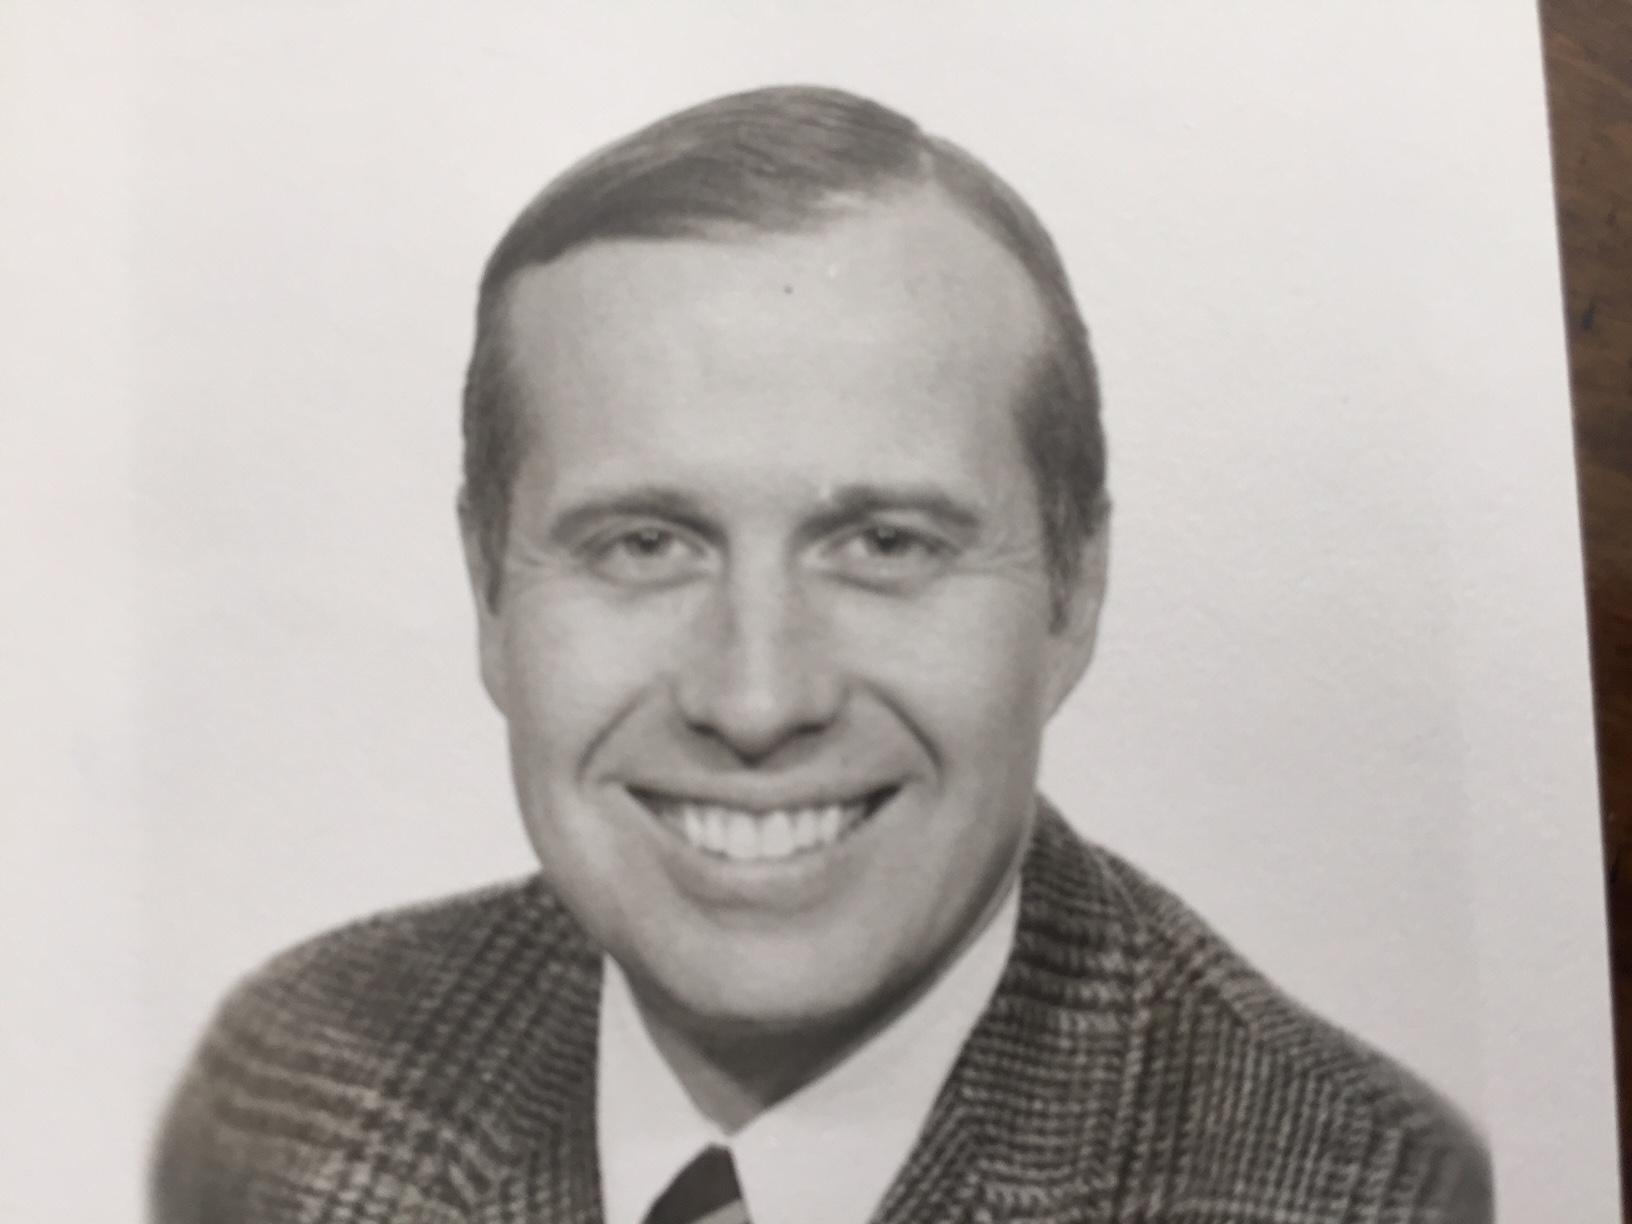 James B Surpless 1980's.jpg